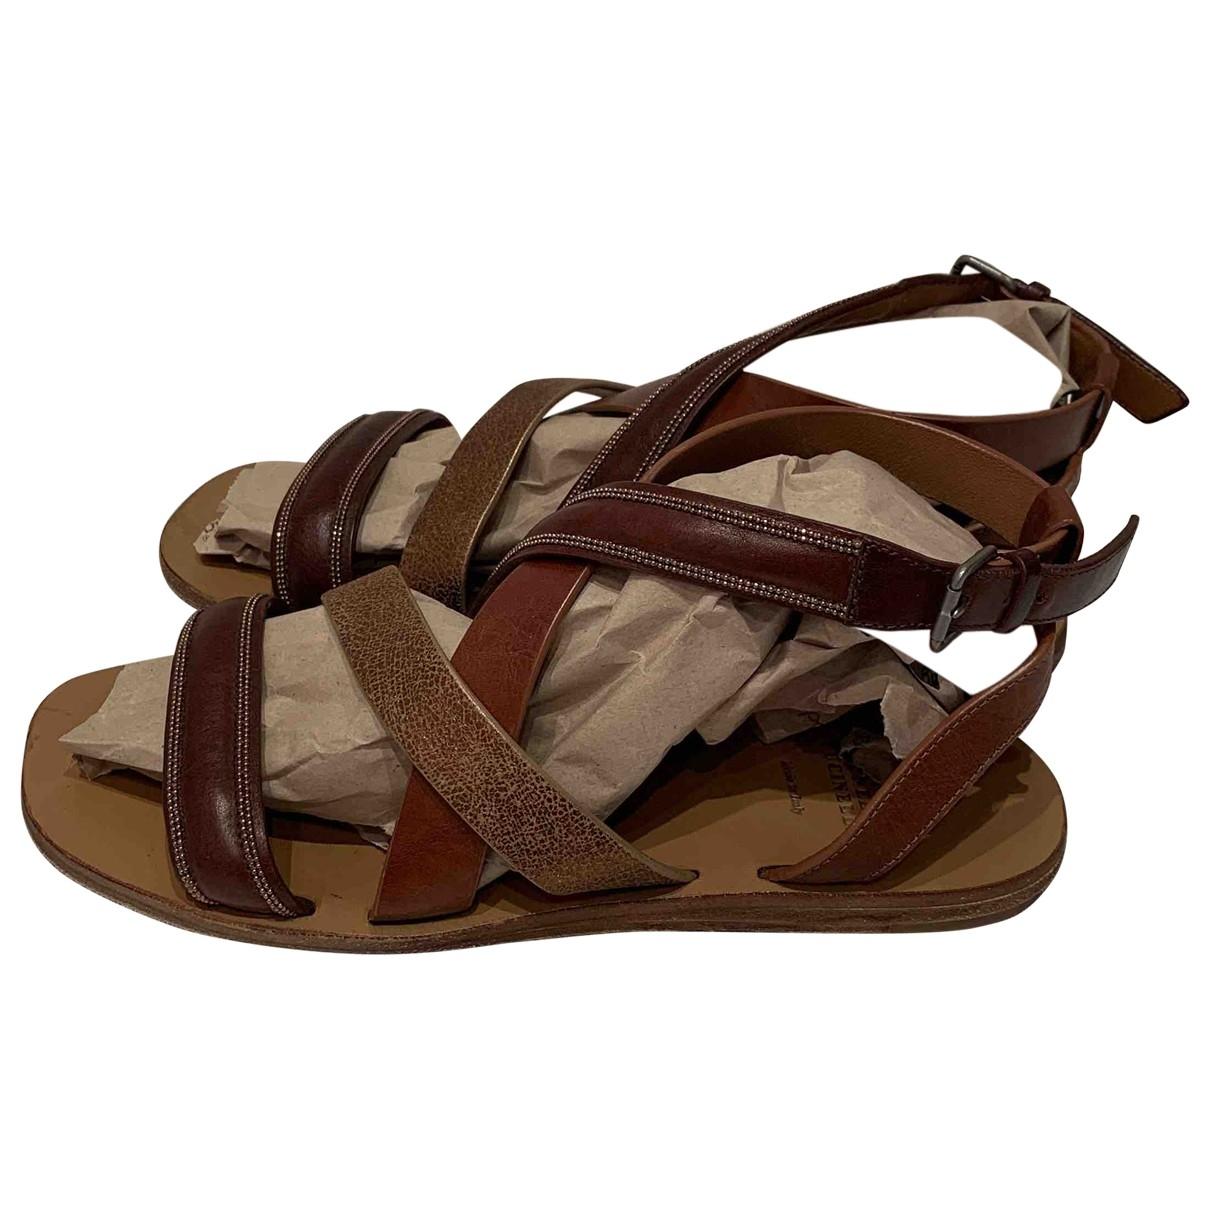 Sandalias romanas de Cuero Brunello Cucinelli